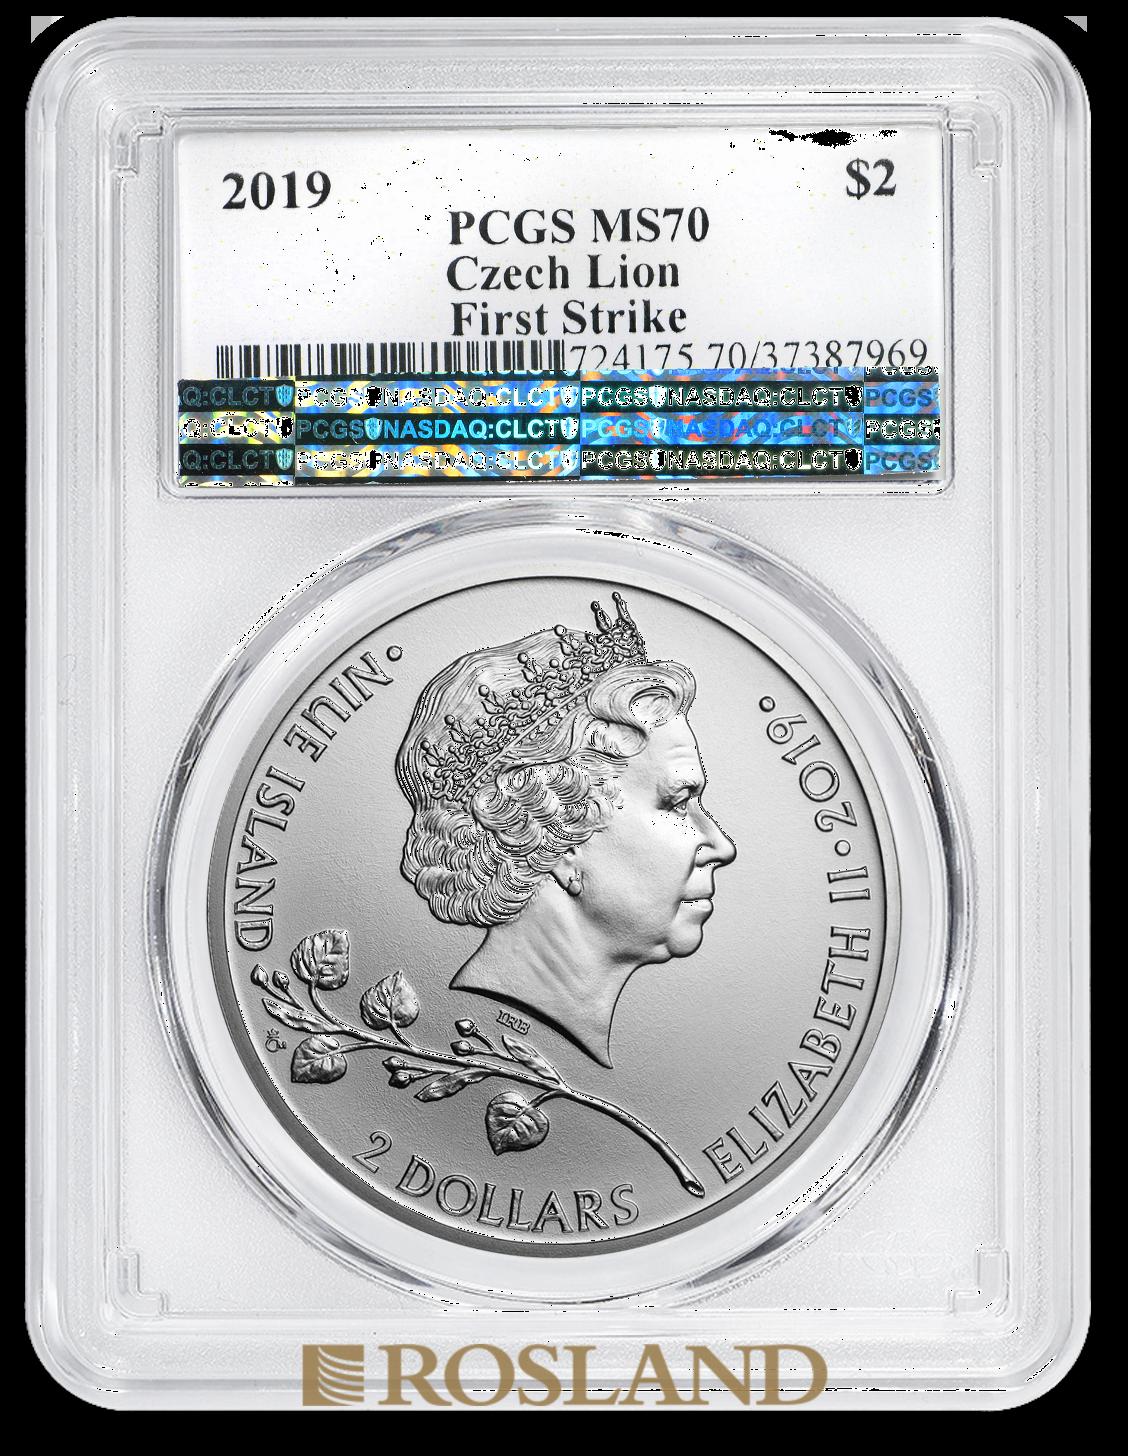 1 Unze Silbermünze Tschechischer Löwe 2019 PCGS MS-70 (FS)